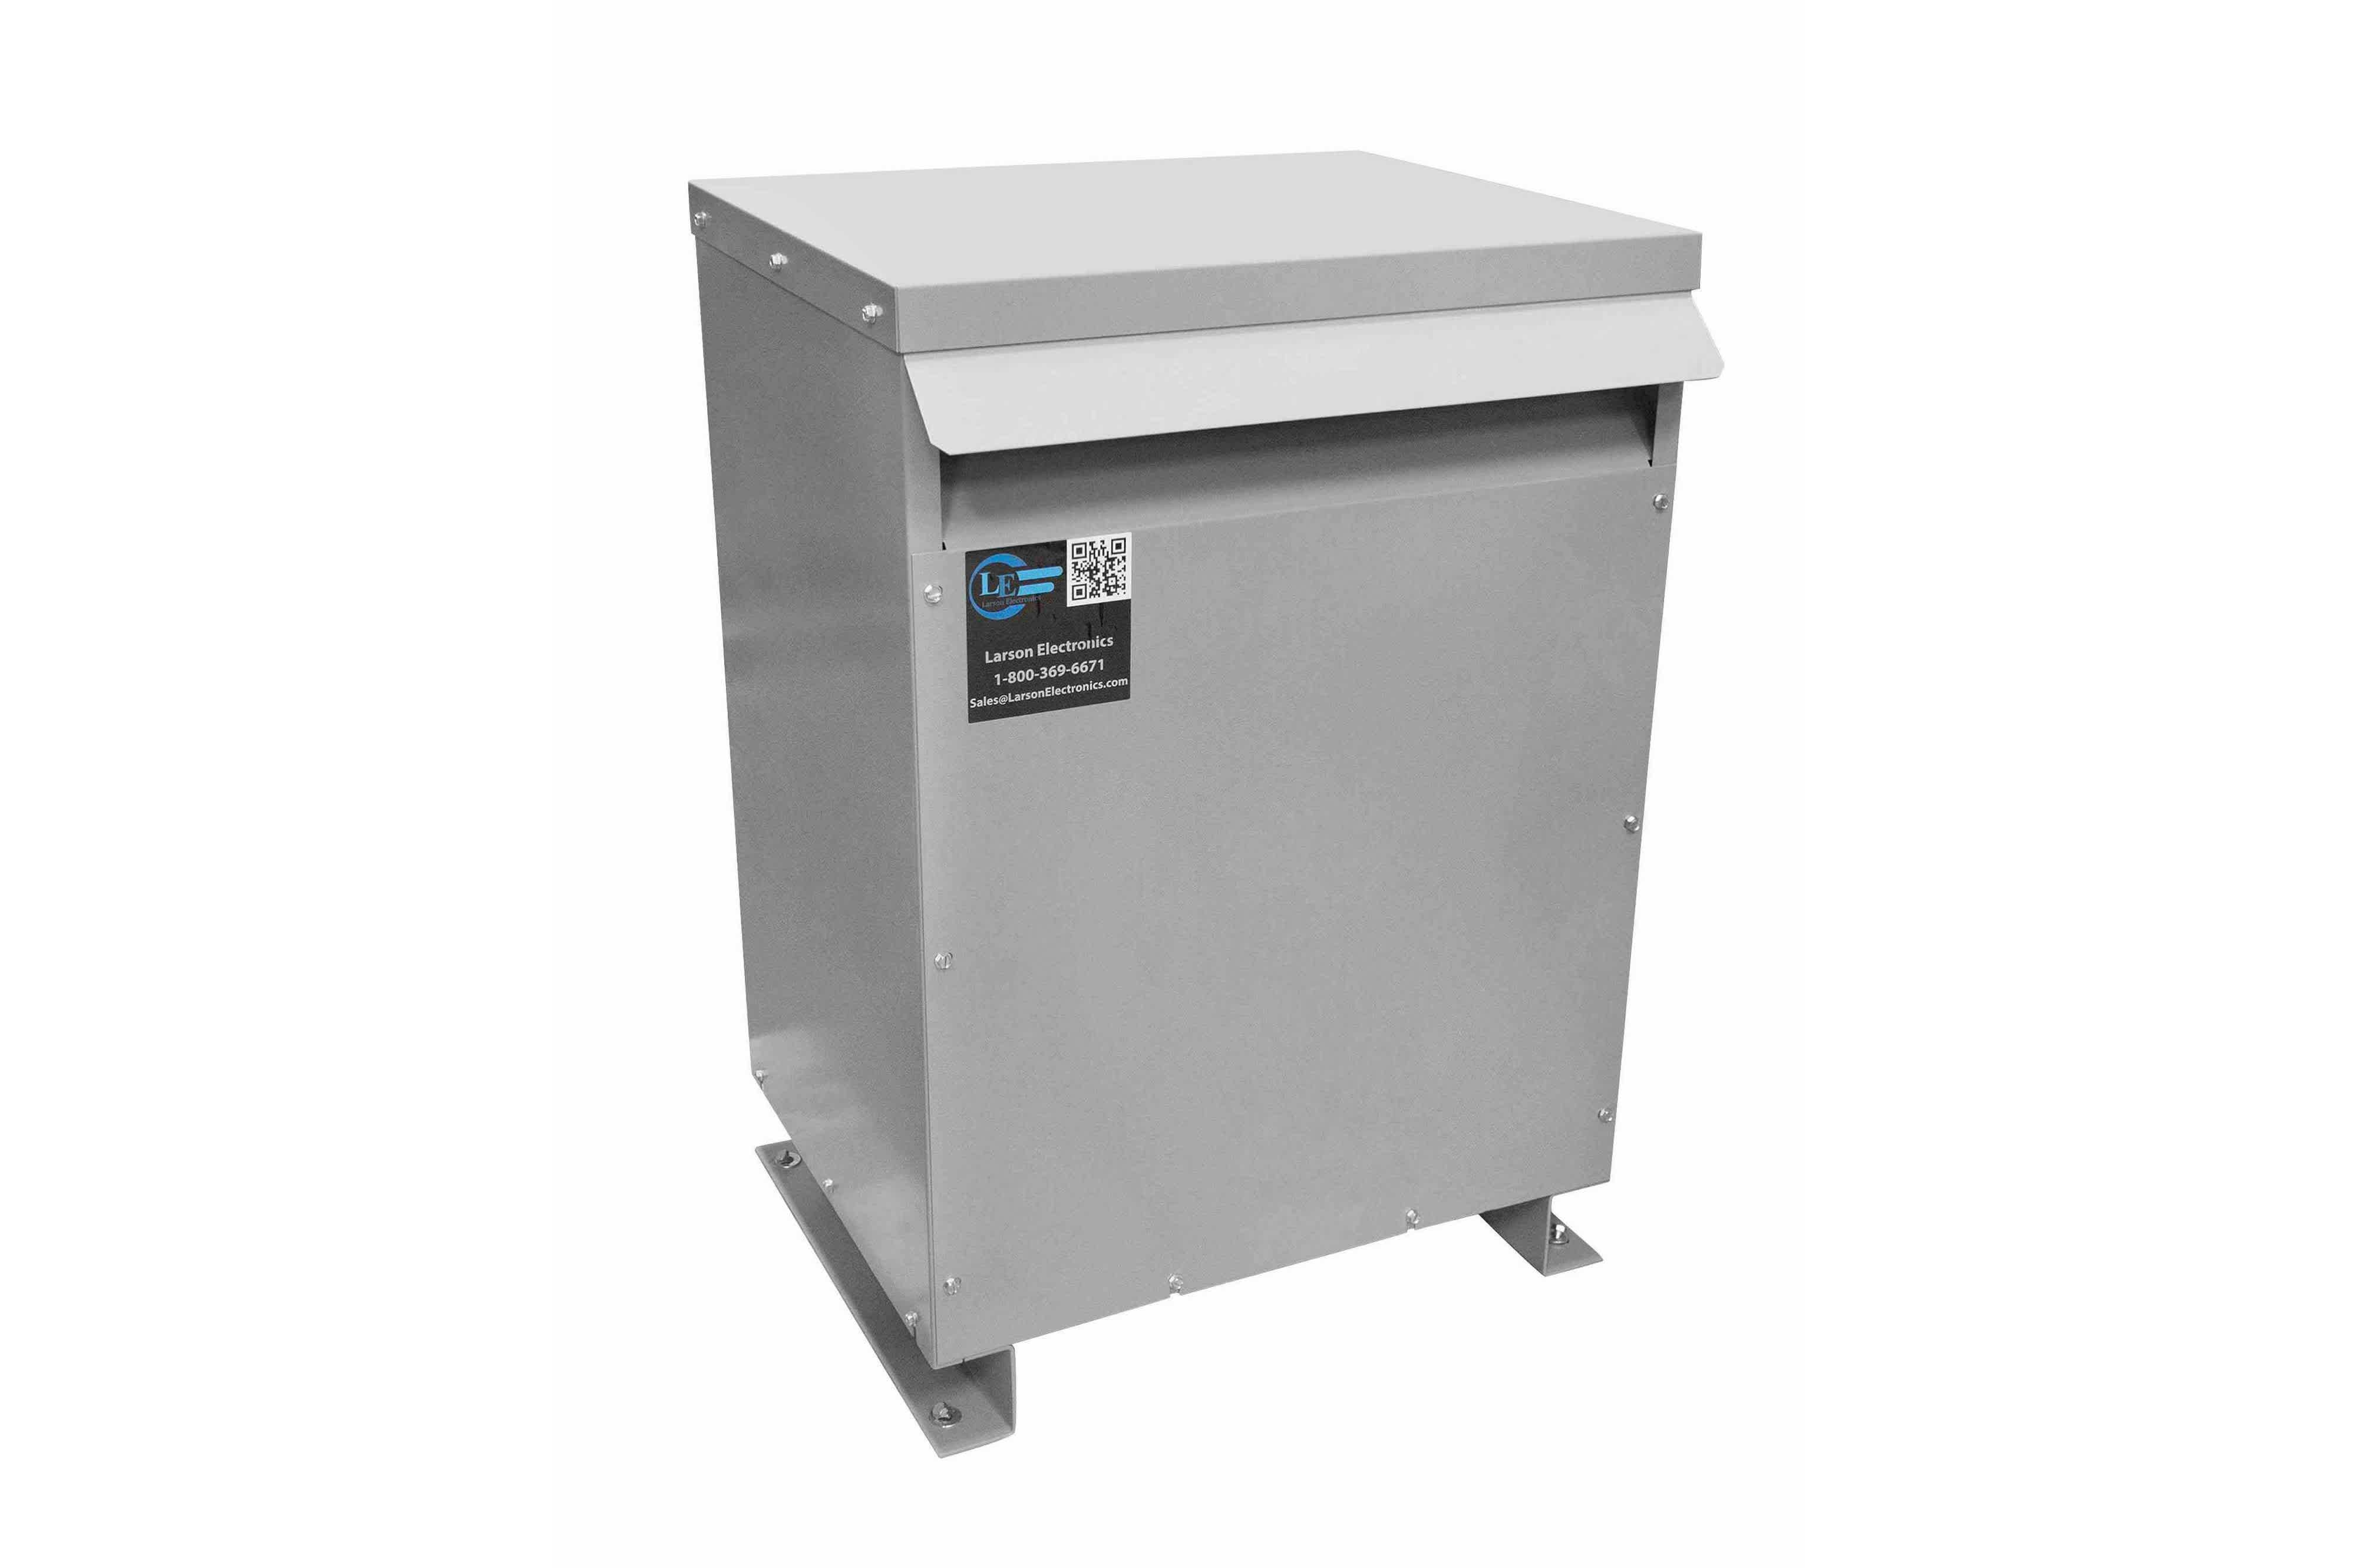 38 kVA 3PH Isolation Transformer, 480V Wye Primary, 575Y/332 Wye-N Secondary, N3R, Ventilated, 60 Hz